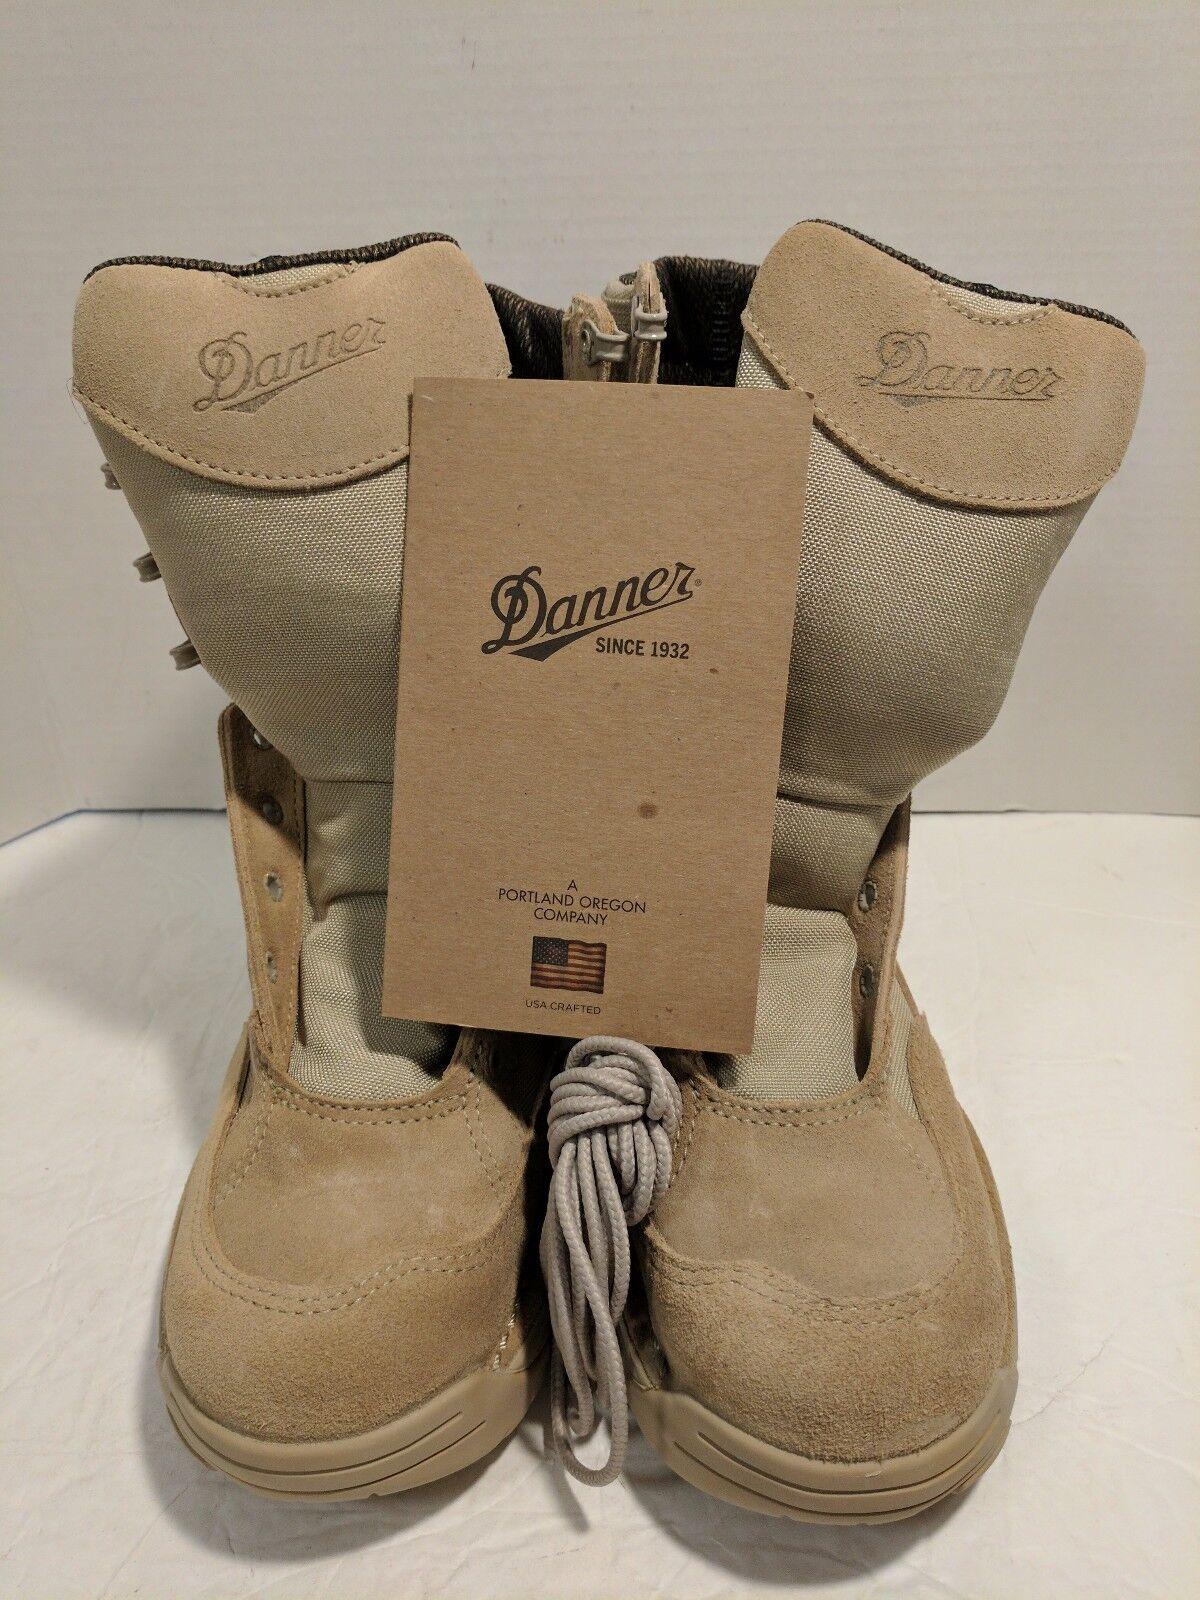 Danner 51495 Rivot TFX GTX Waterproof Gore-Tex Women's Military Boot ~ Size 9.5